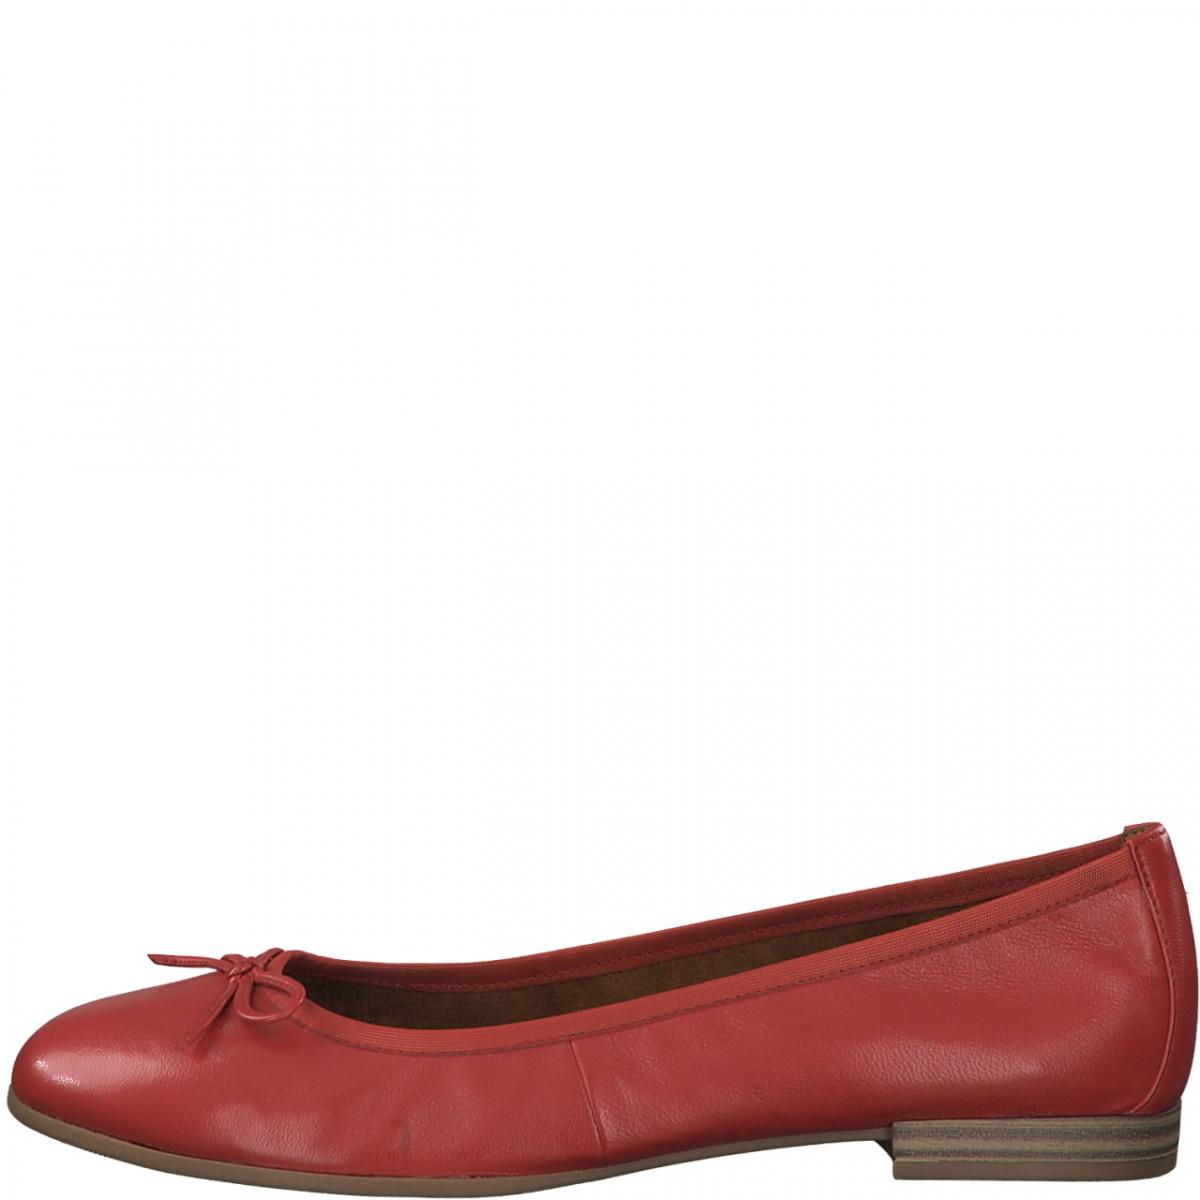 Tamaris -Ballerina pelle rossa